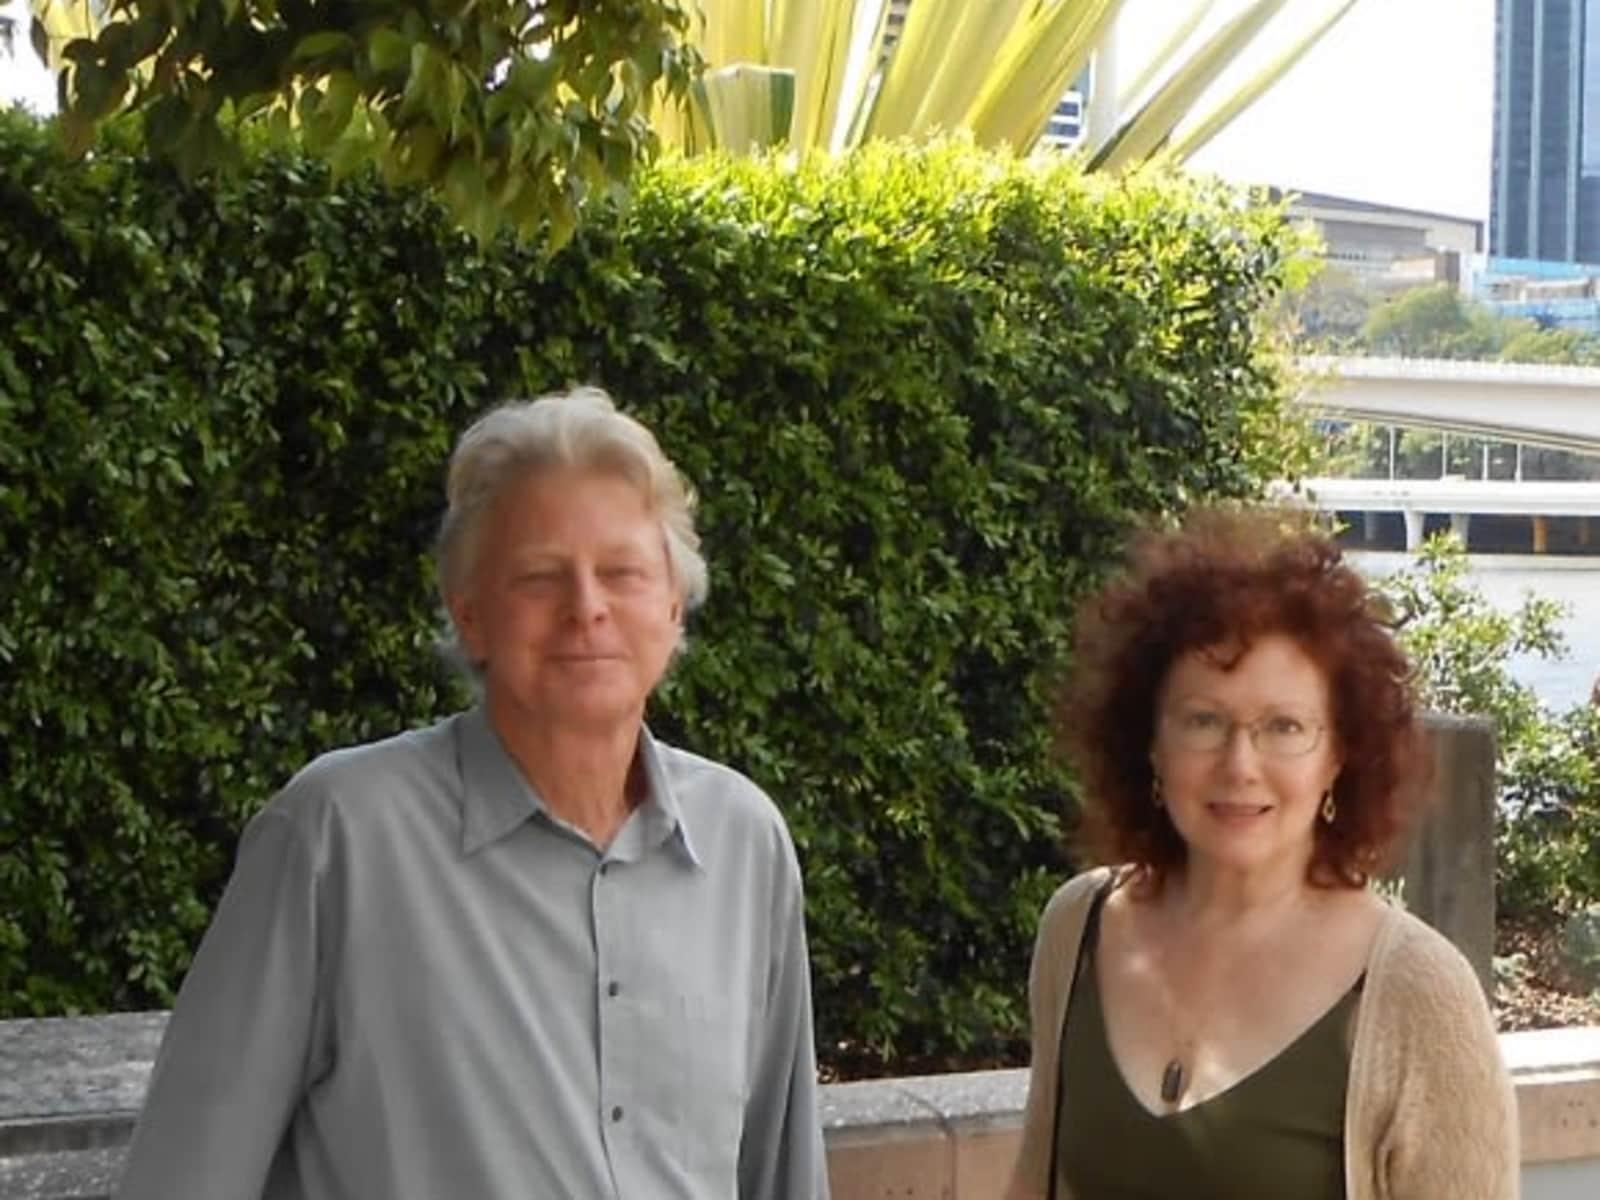 J.a. & Michael from Brisbane, Queensland, Australia